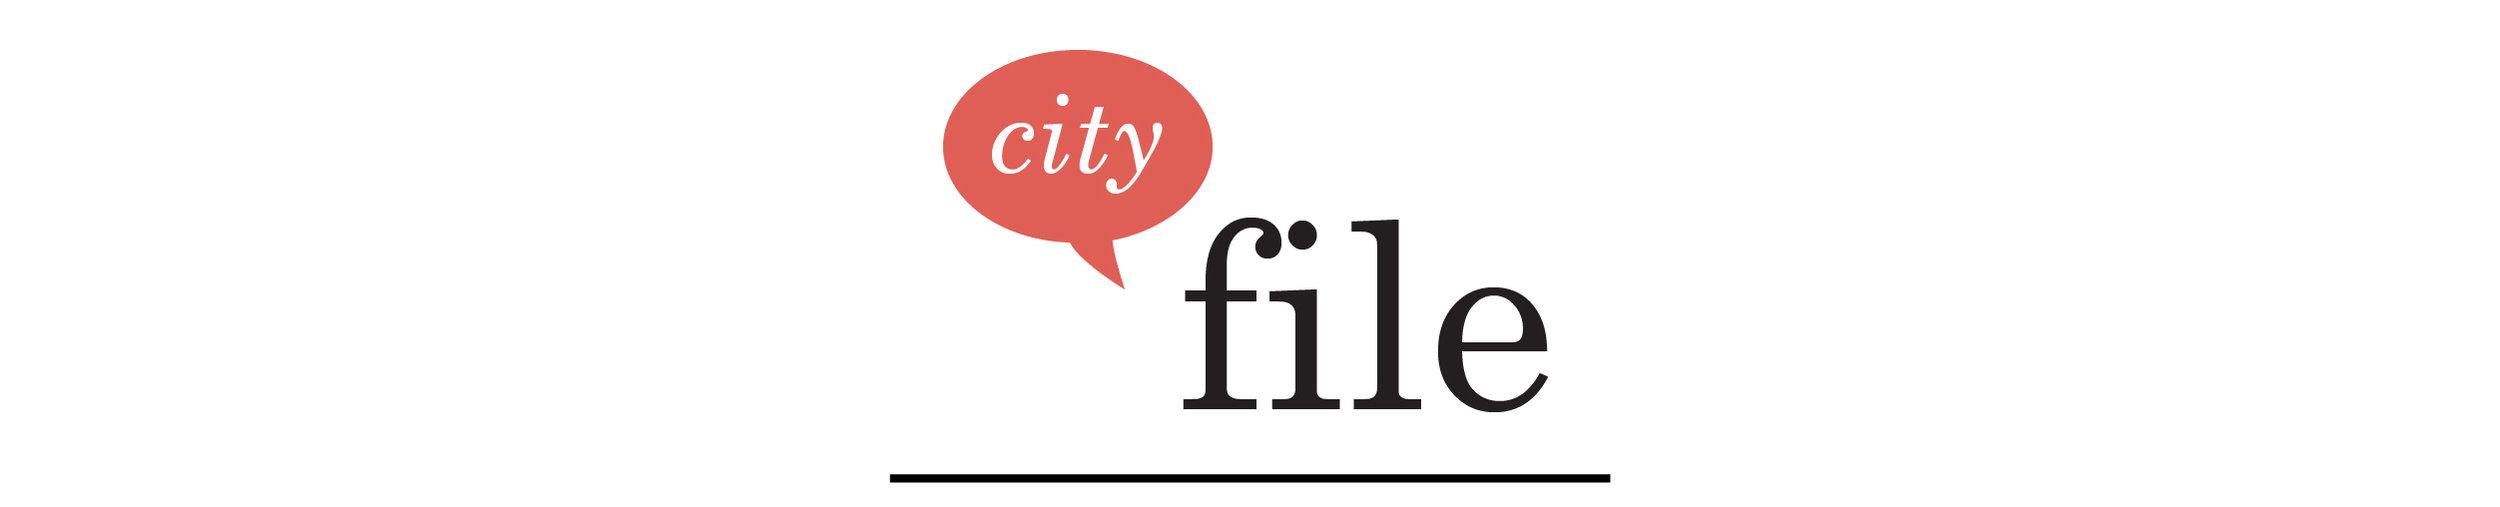 city file header-08-08.jpg